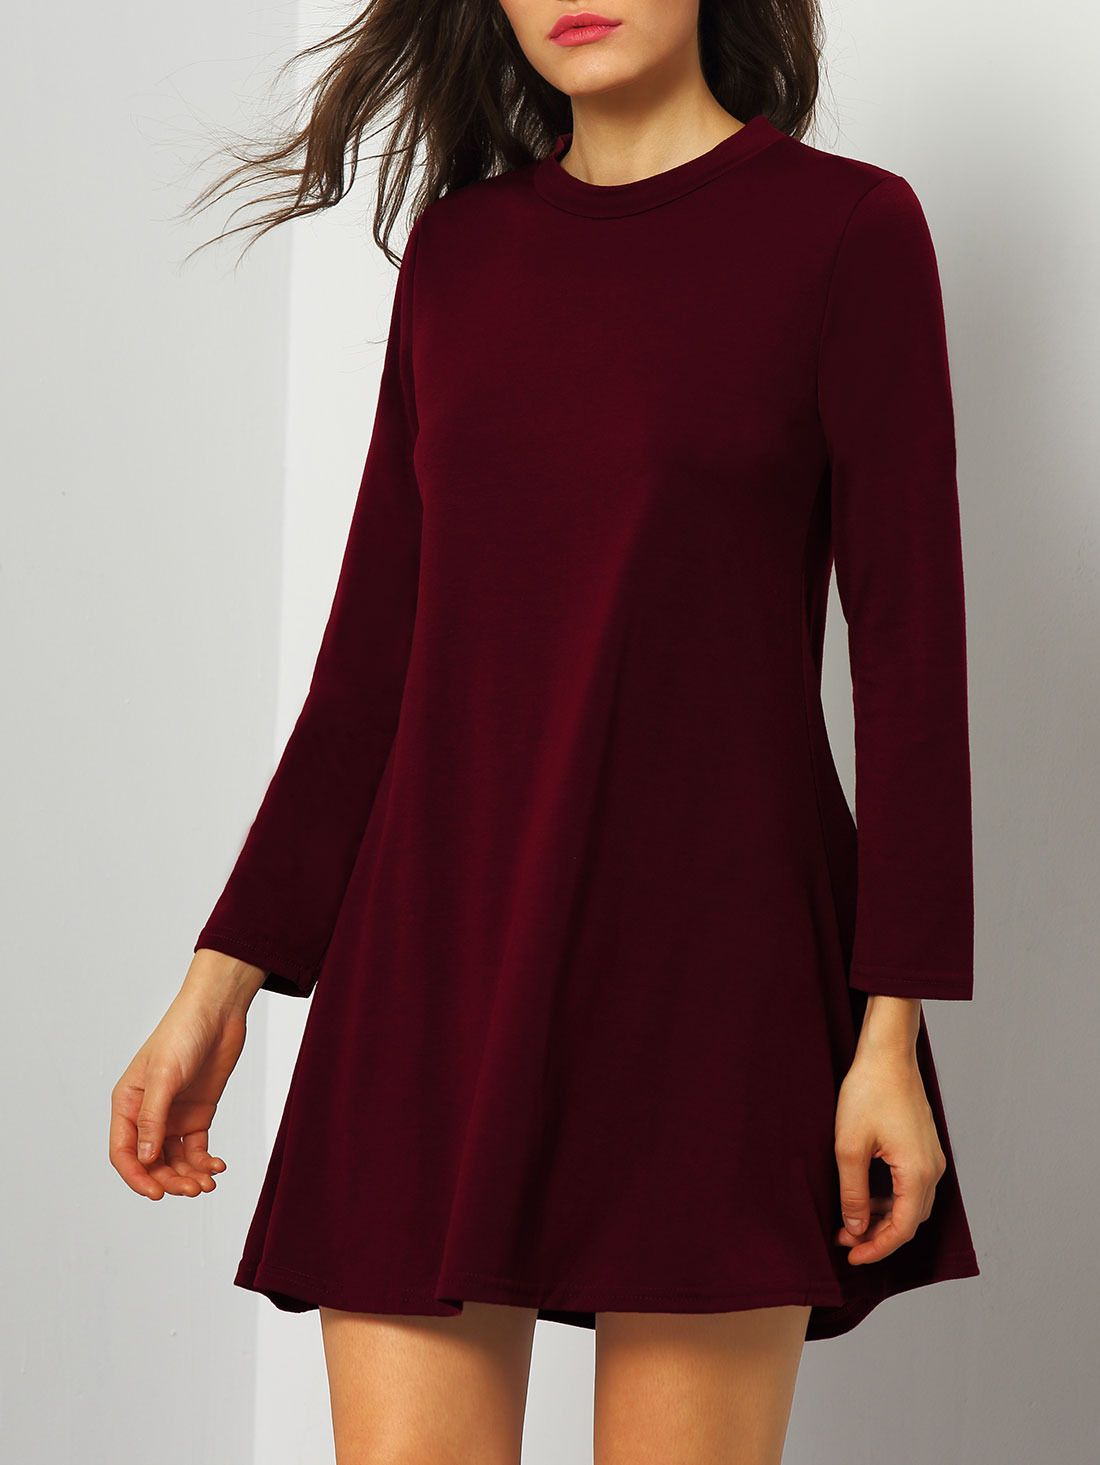 09dfc27f7d Vestido manga larga holgado -borgoña-Spanish SheIn(Sheinside) Latest Dress